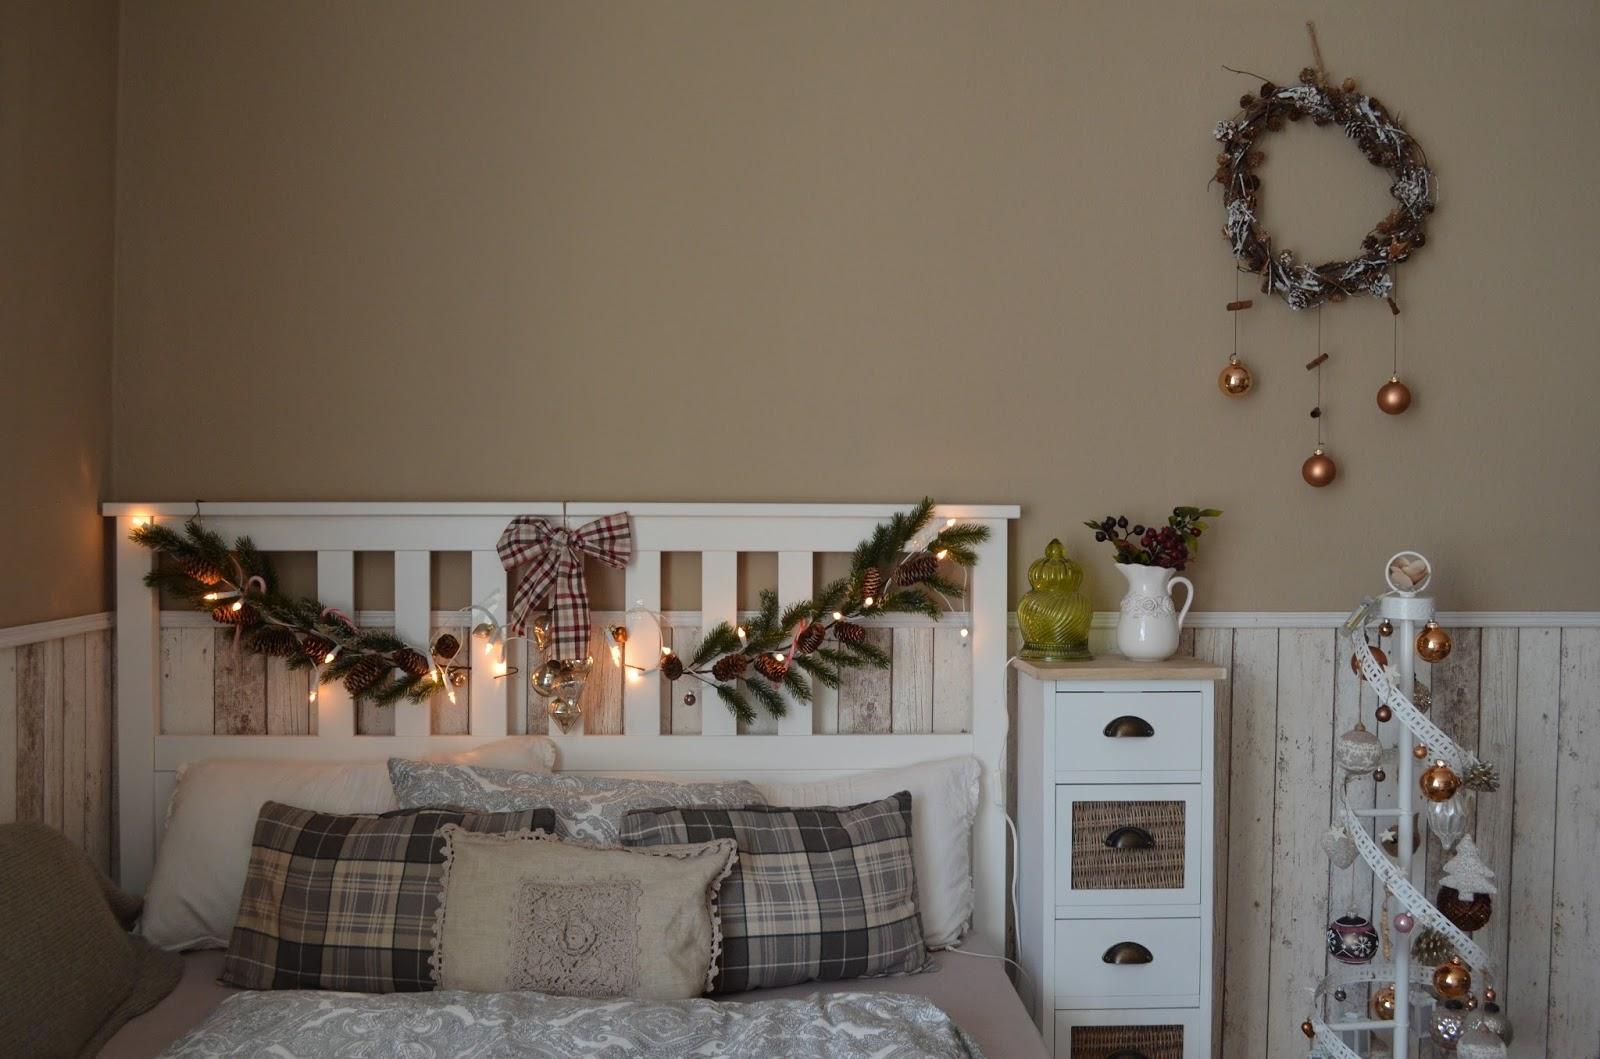 deartally november 2016. Black Bedroom Furniture Sets. Home Design Ideas